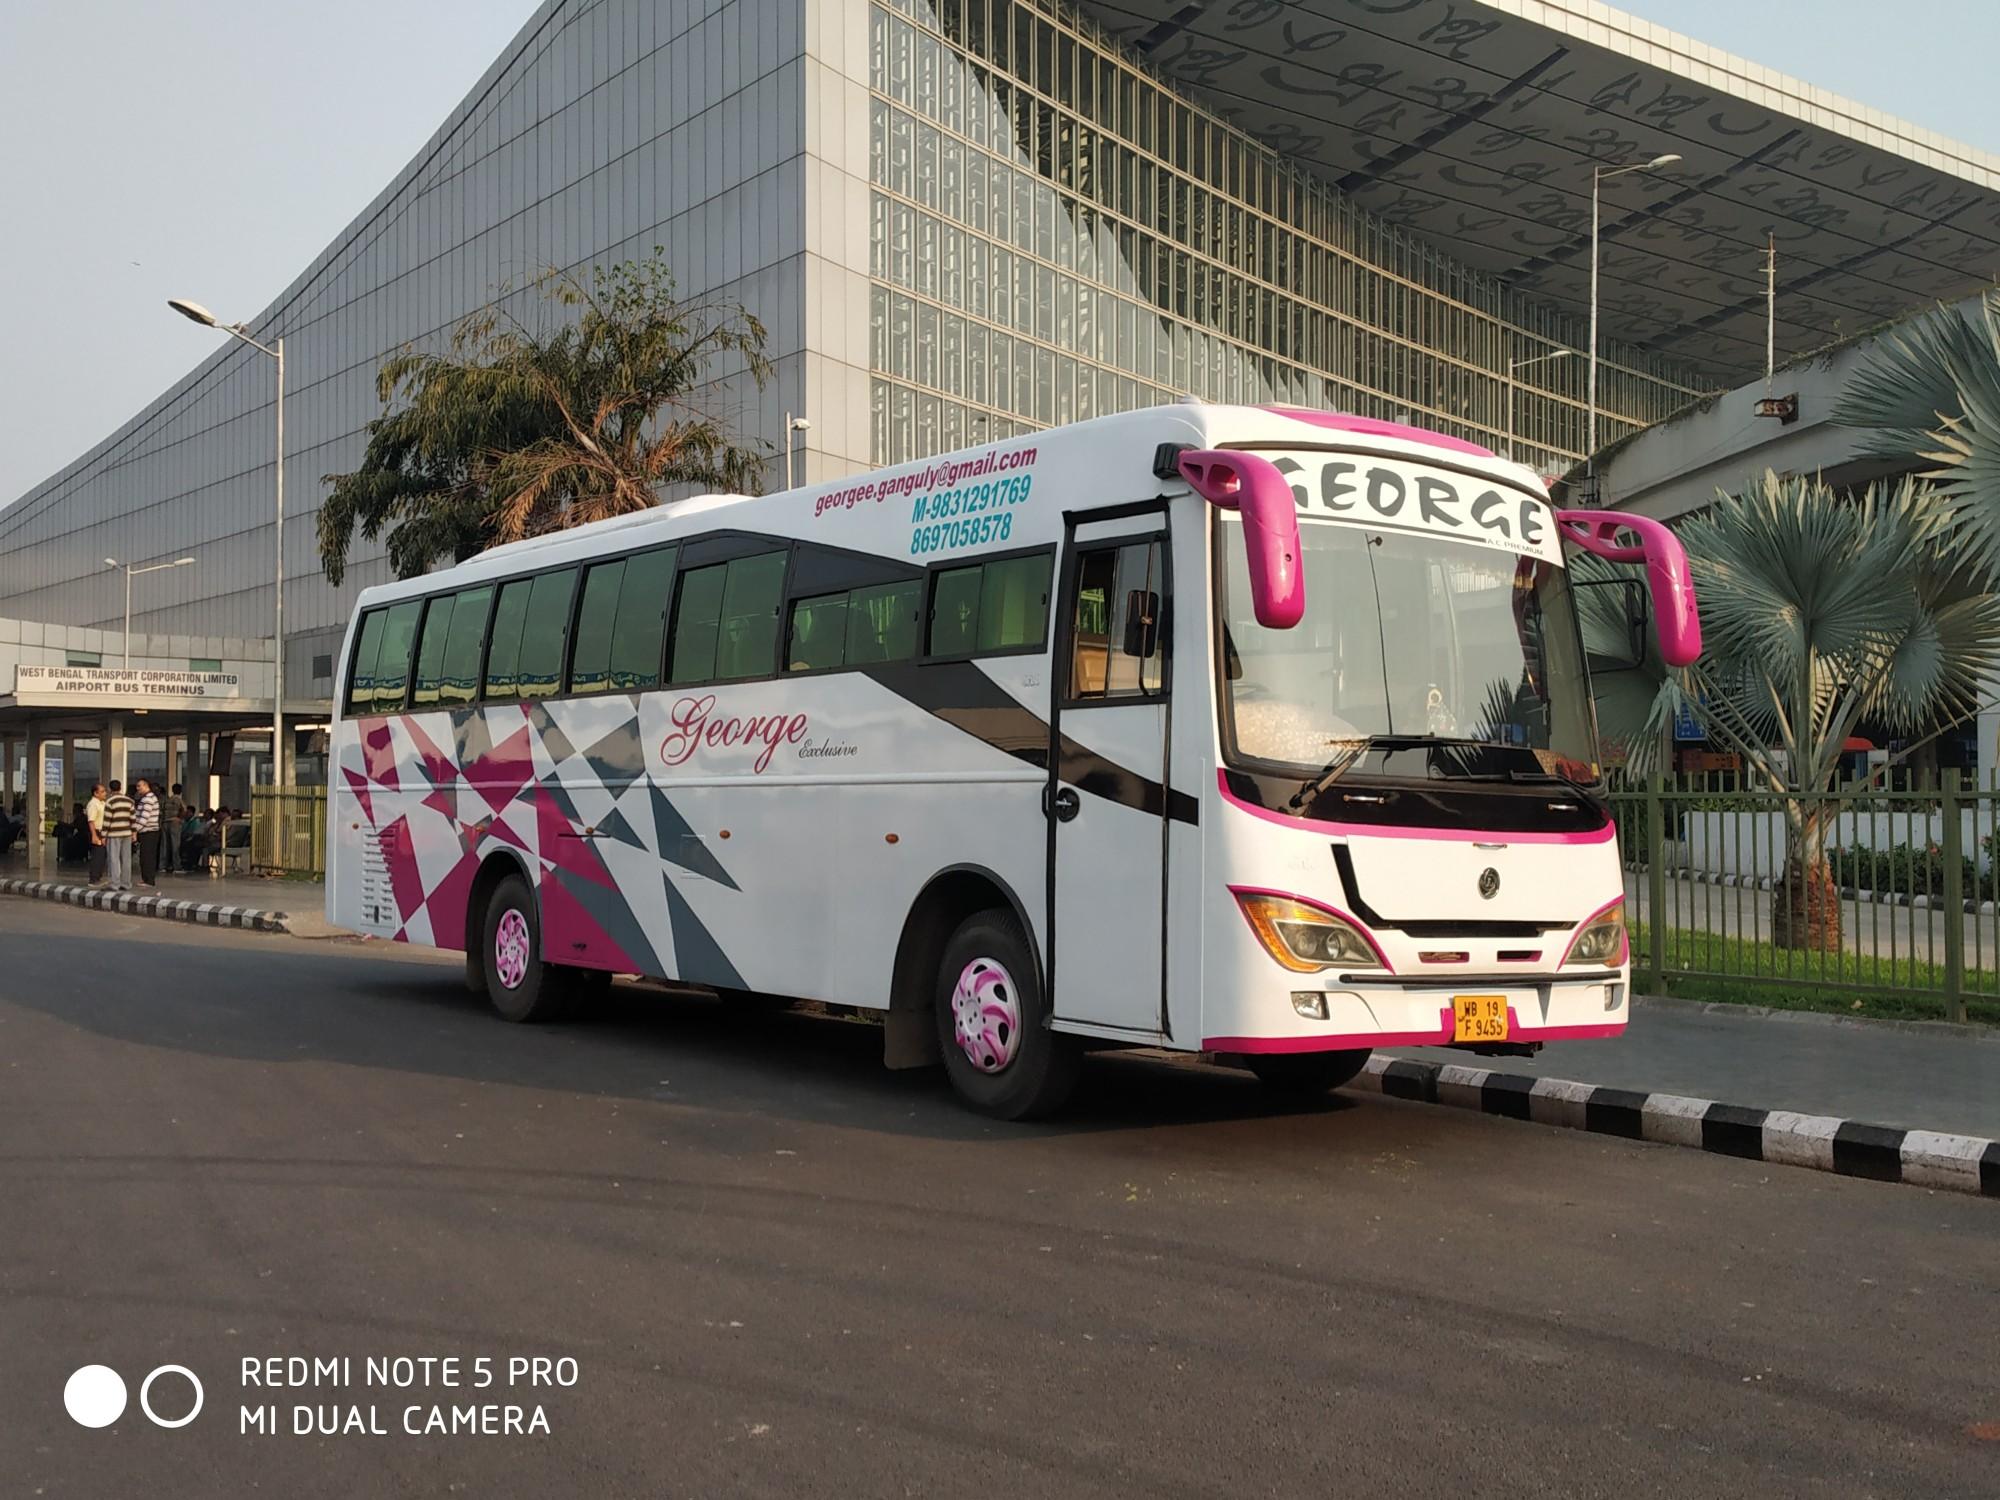 35, 36, 40, 54, 55 seater Bus Rental in Kolkata, Chartered